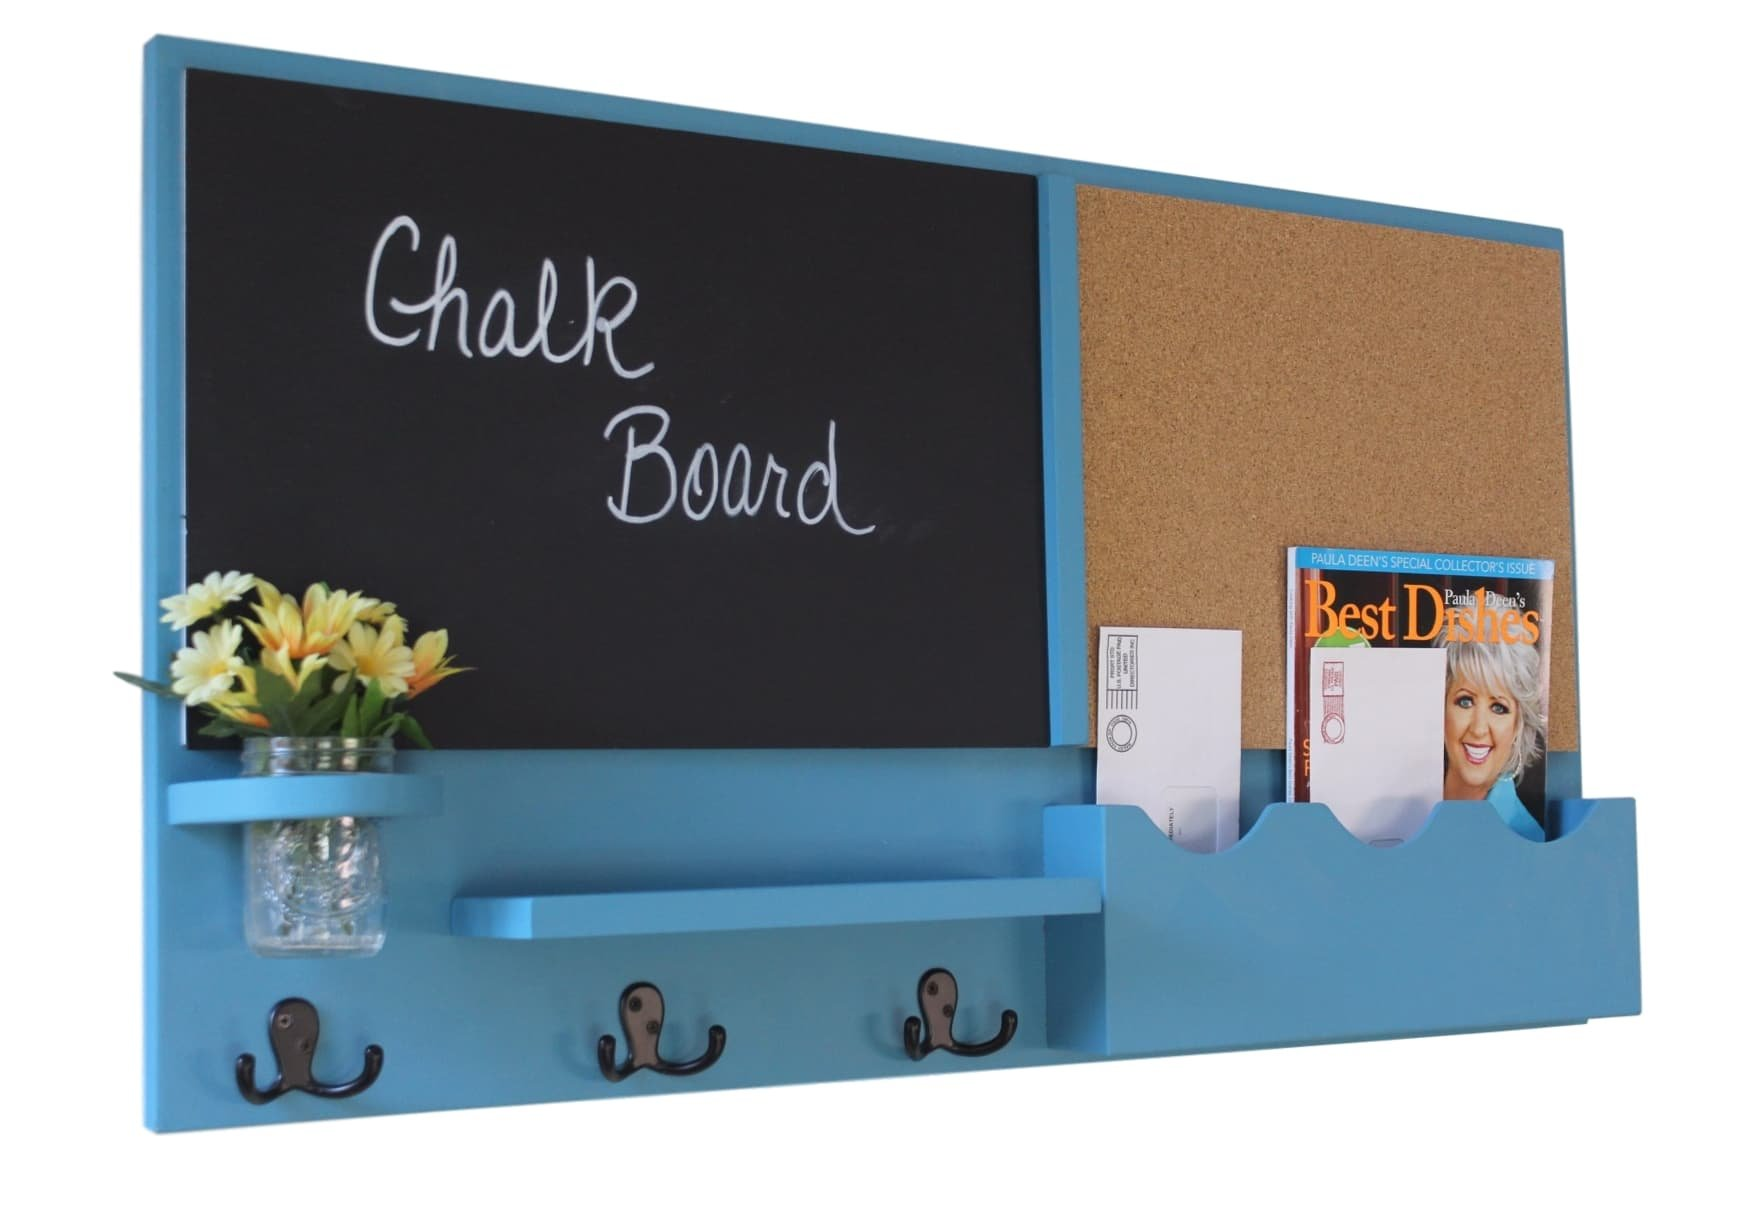 Legacy Studio Décor Message Center with Chalkboard Cork Board Mail Organizer Key Hooks Coat Hooks Mason Jar (Smooth, Teal)